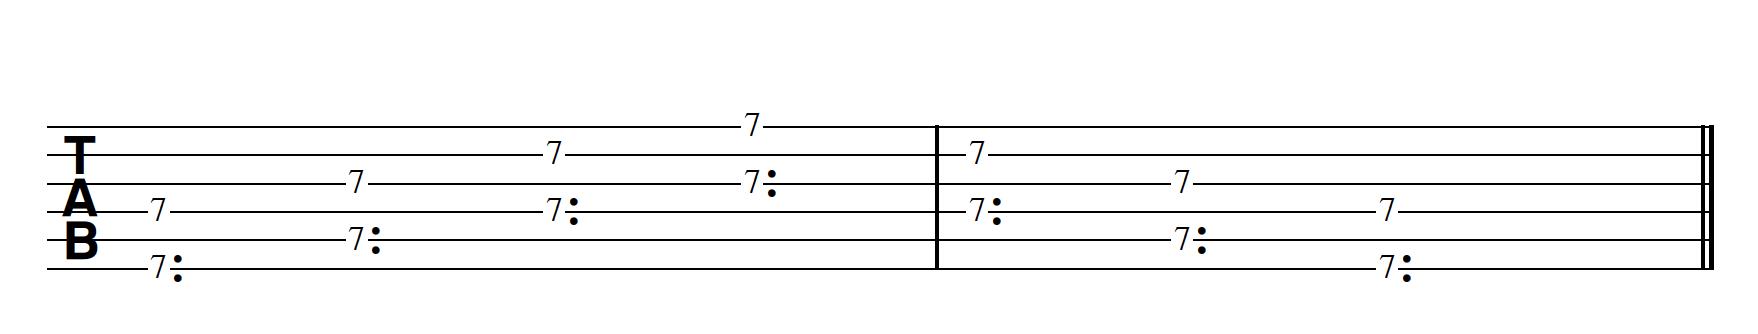 Harp Harmonic Pattern 2 Notes Together Bm7/11